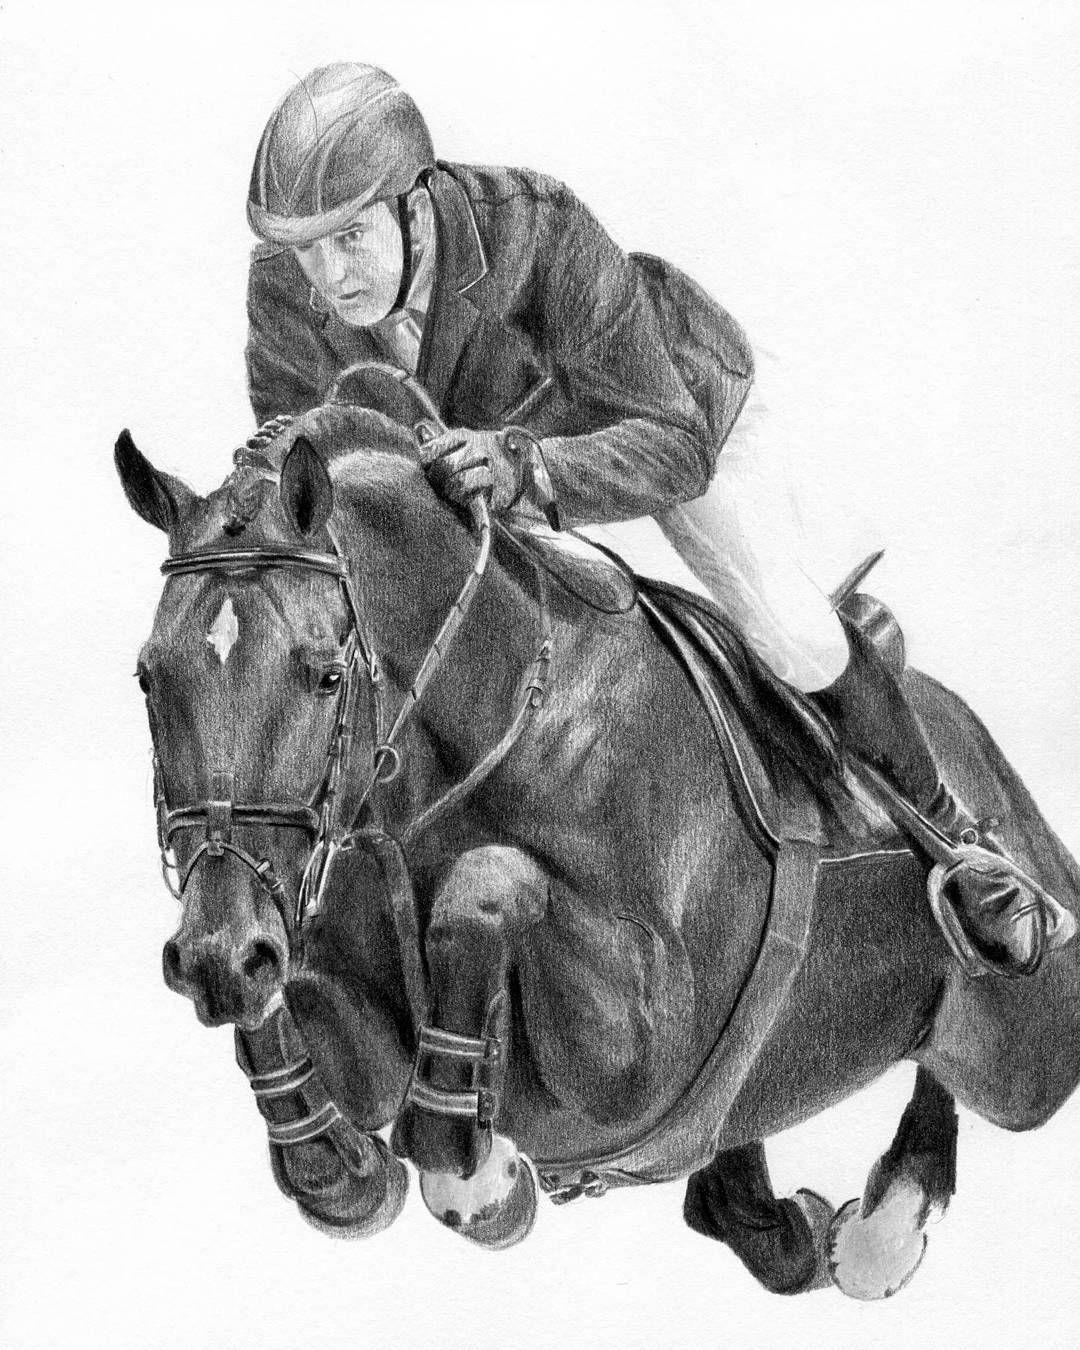 Konie Horse Pferd Horsesofinstagram Equine Equestrian Artist Art Pencil Pencildrawing Draw Drawing Whitaker Rysu Paard Tekeningen Zebra S Tekenen